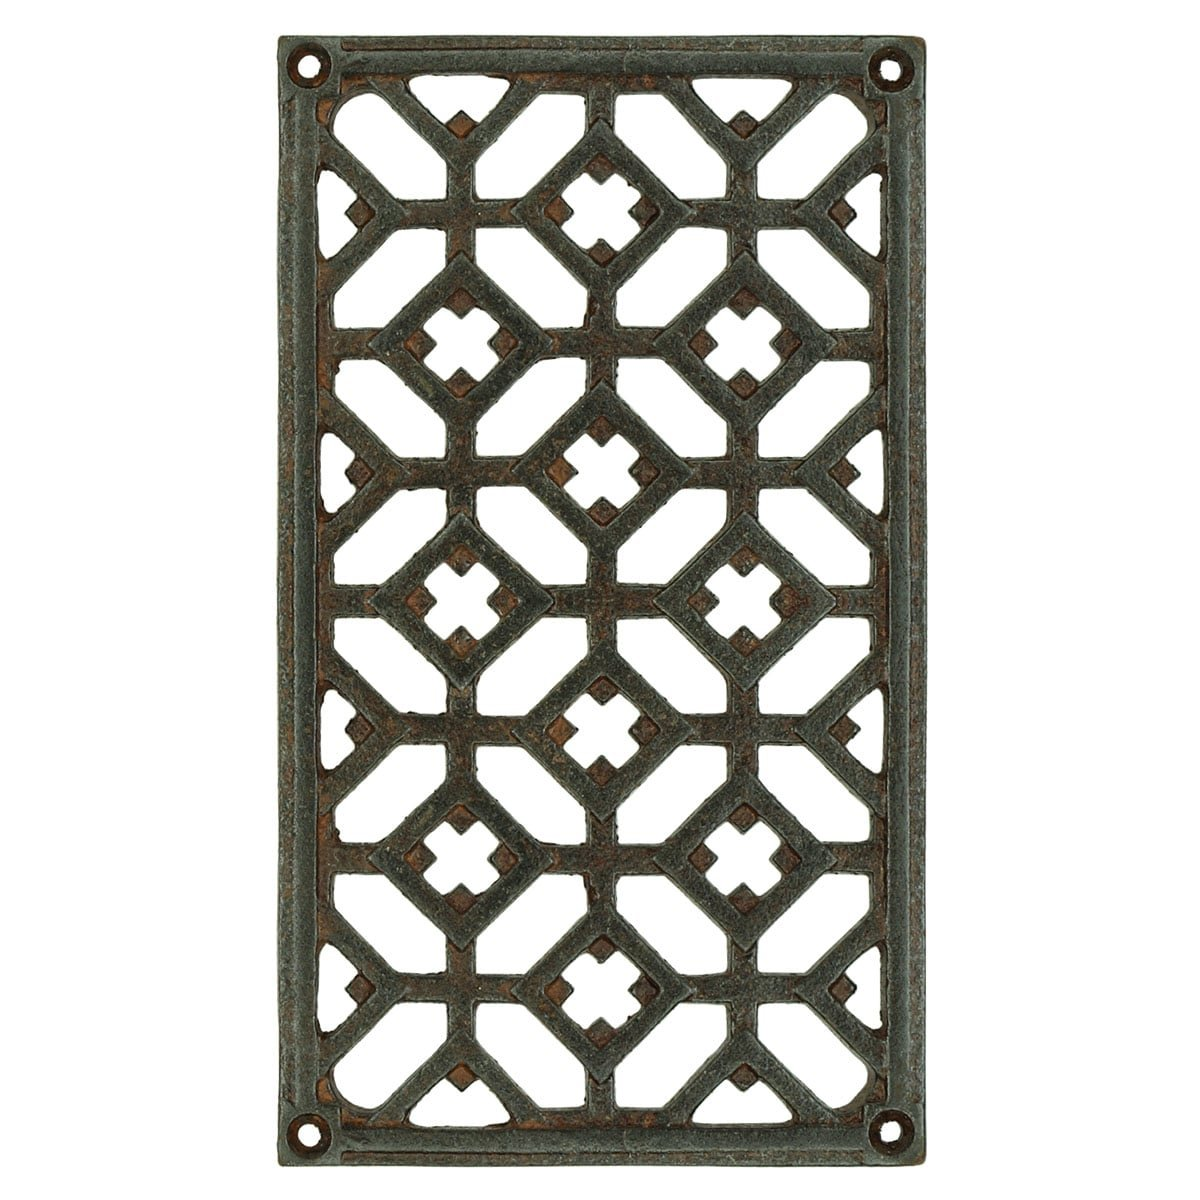 Hardware Grilles & Grates Air vent grill door antique Calbe - 200 mm